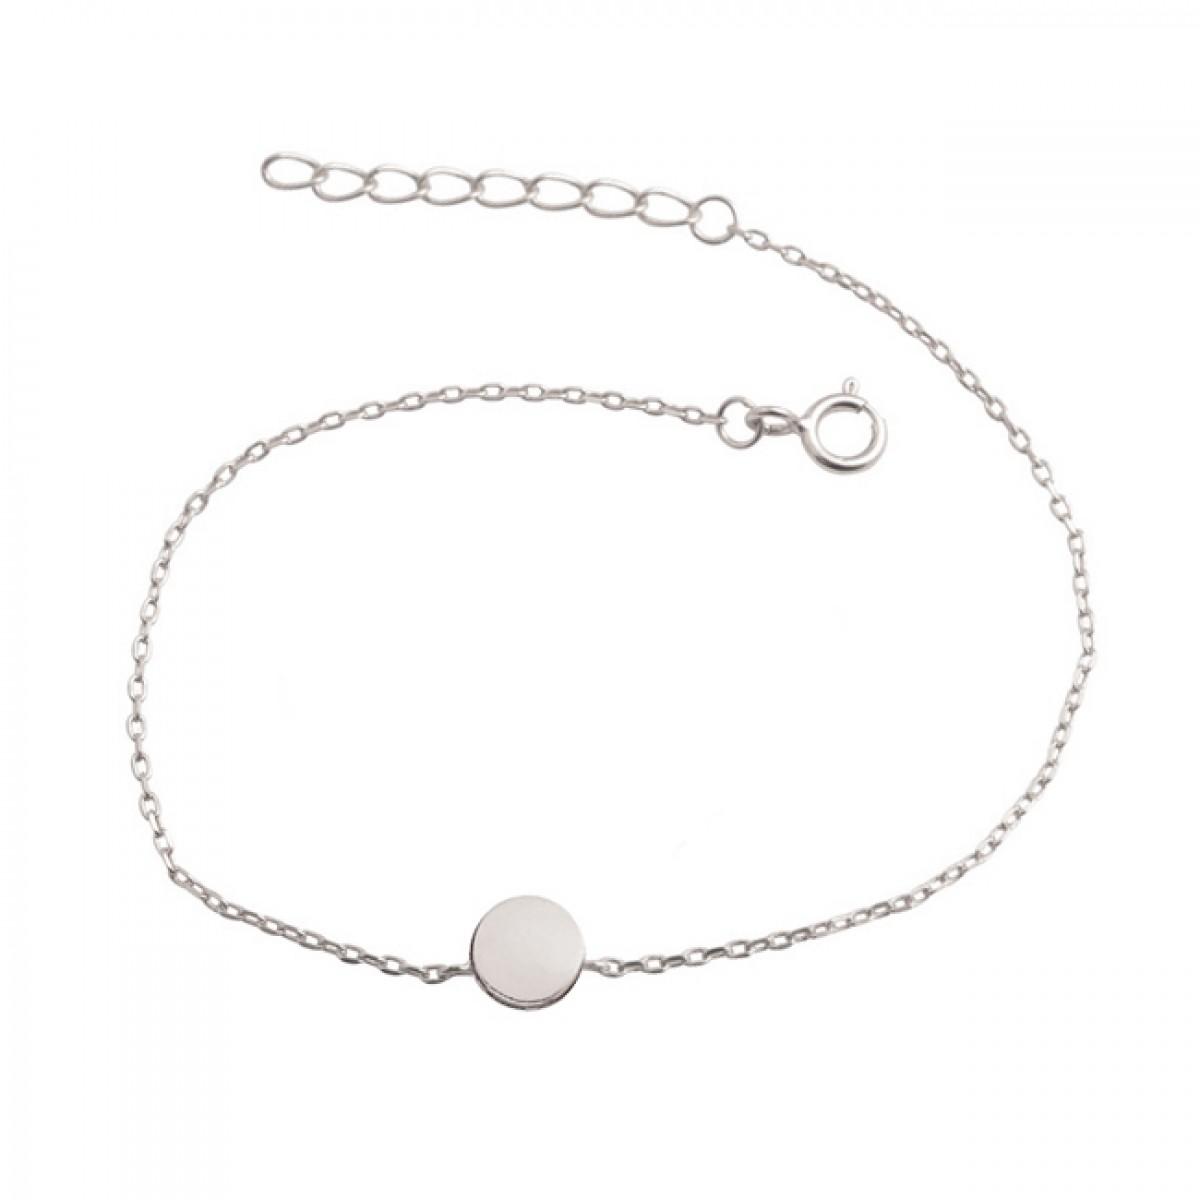 Anoa Armband Freya 925 Sterling Silber